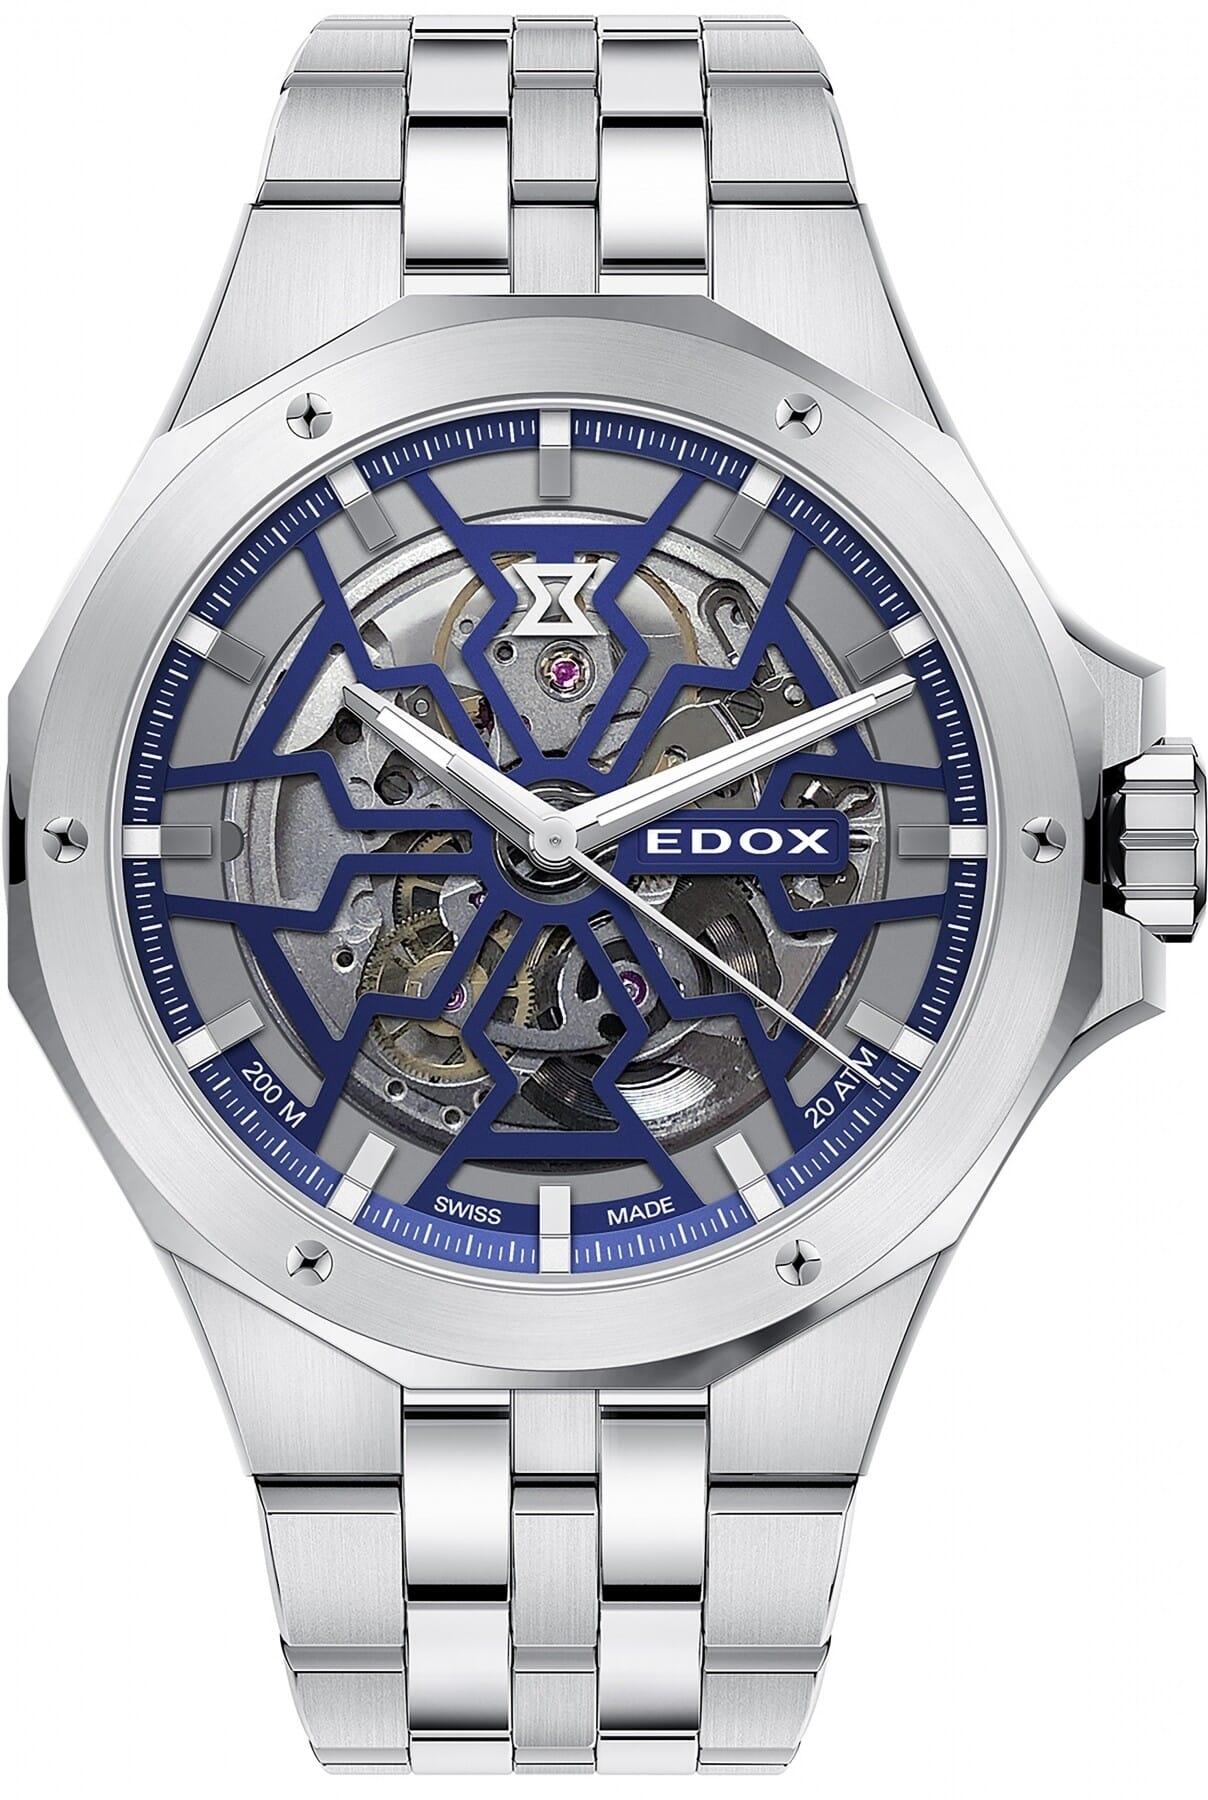 Edox 85303 3M BUIGB